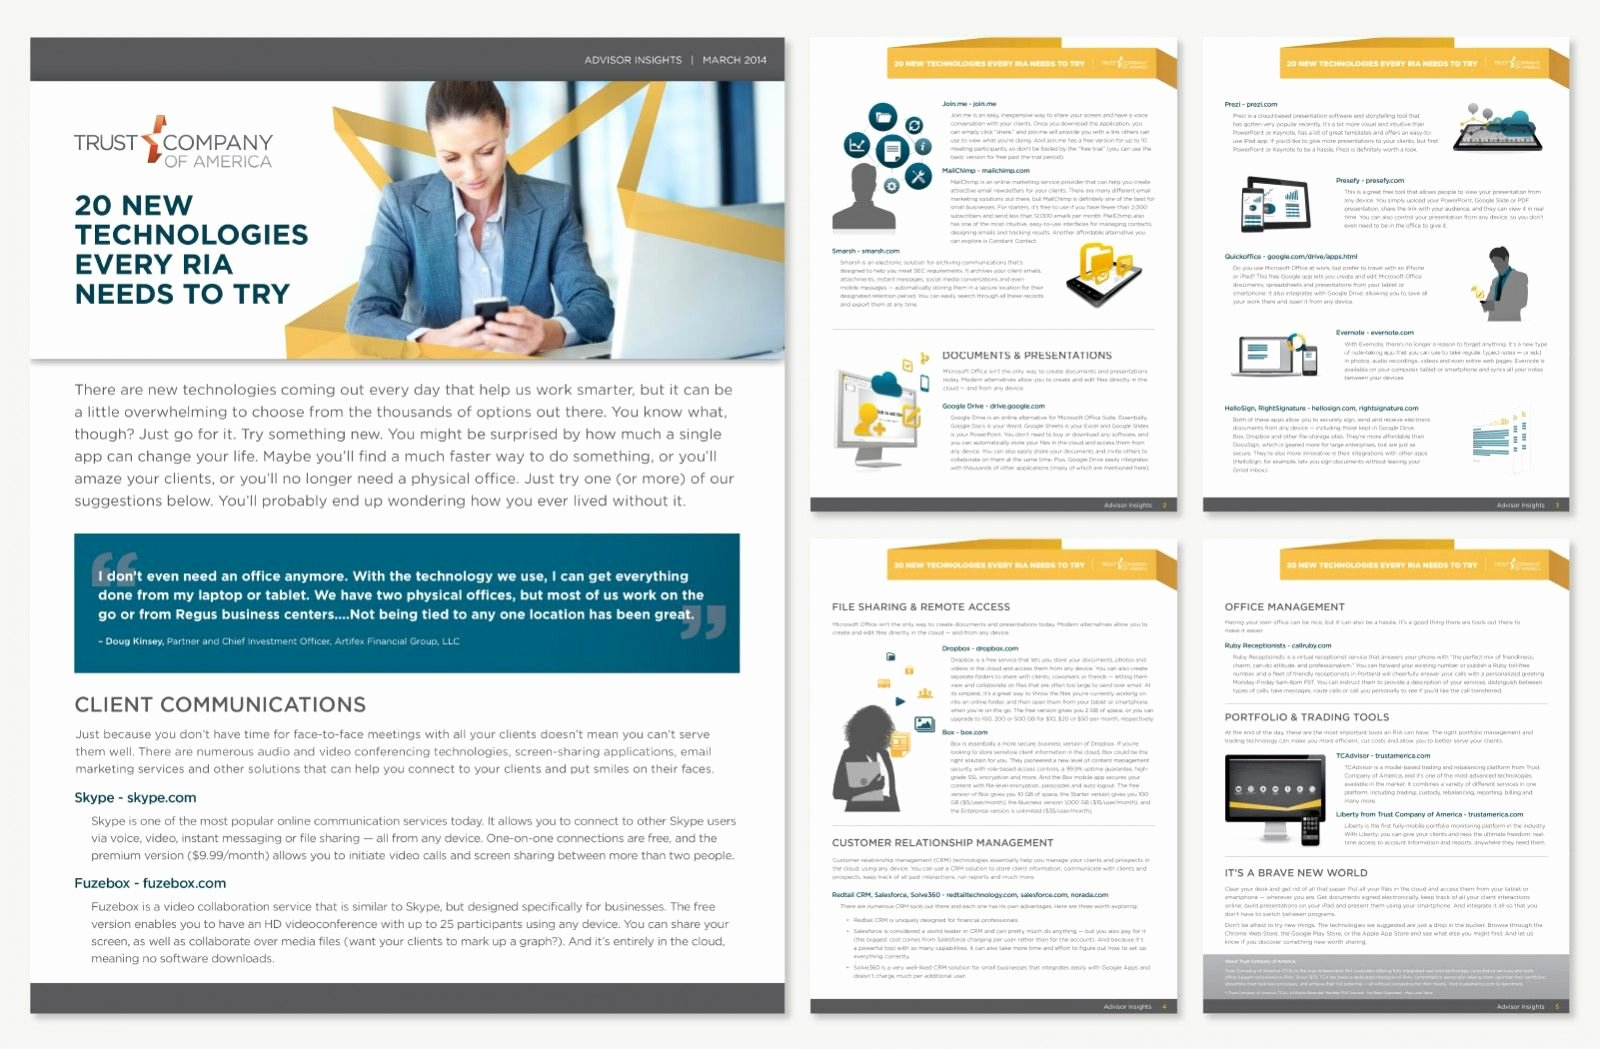 White Paper Design Template Lovely Trust Branded White Paper On the Virtual Work Environment